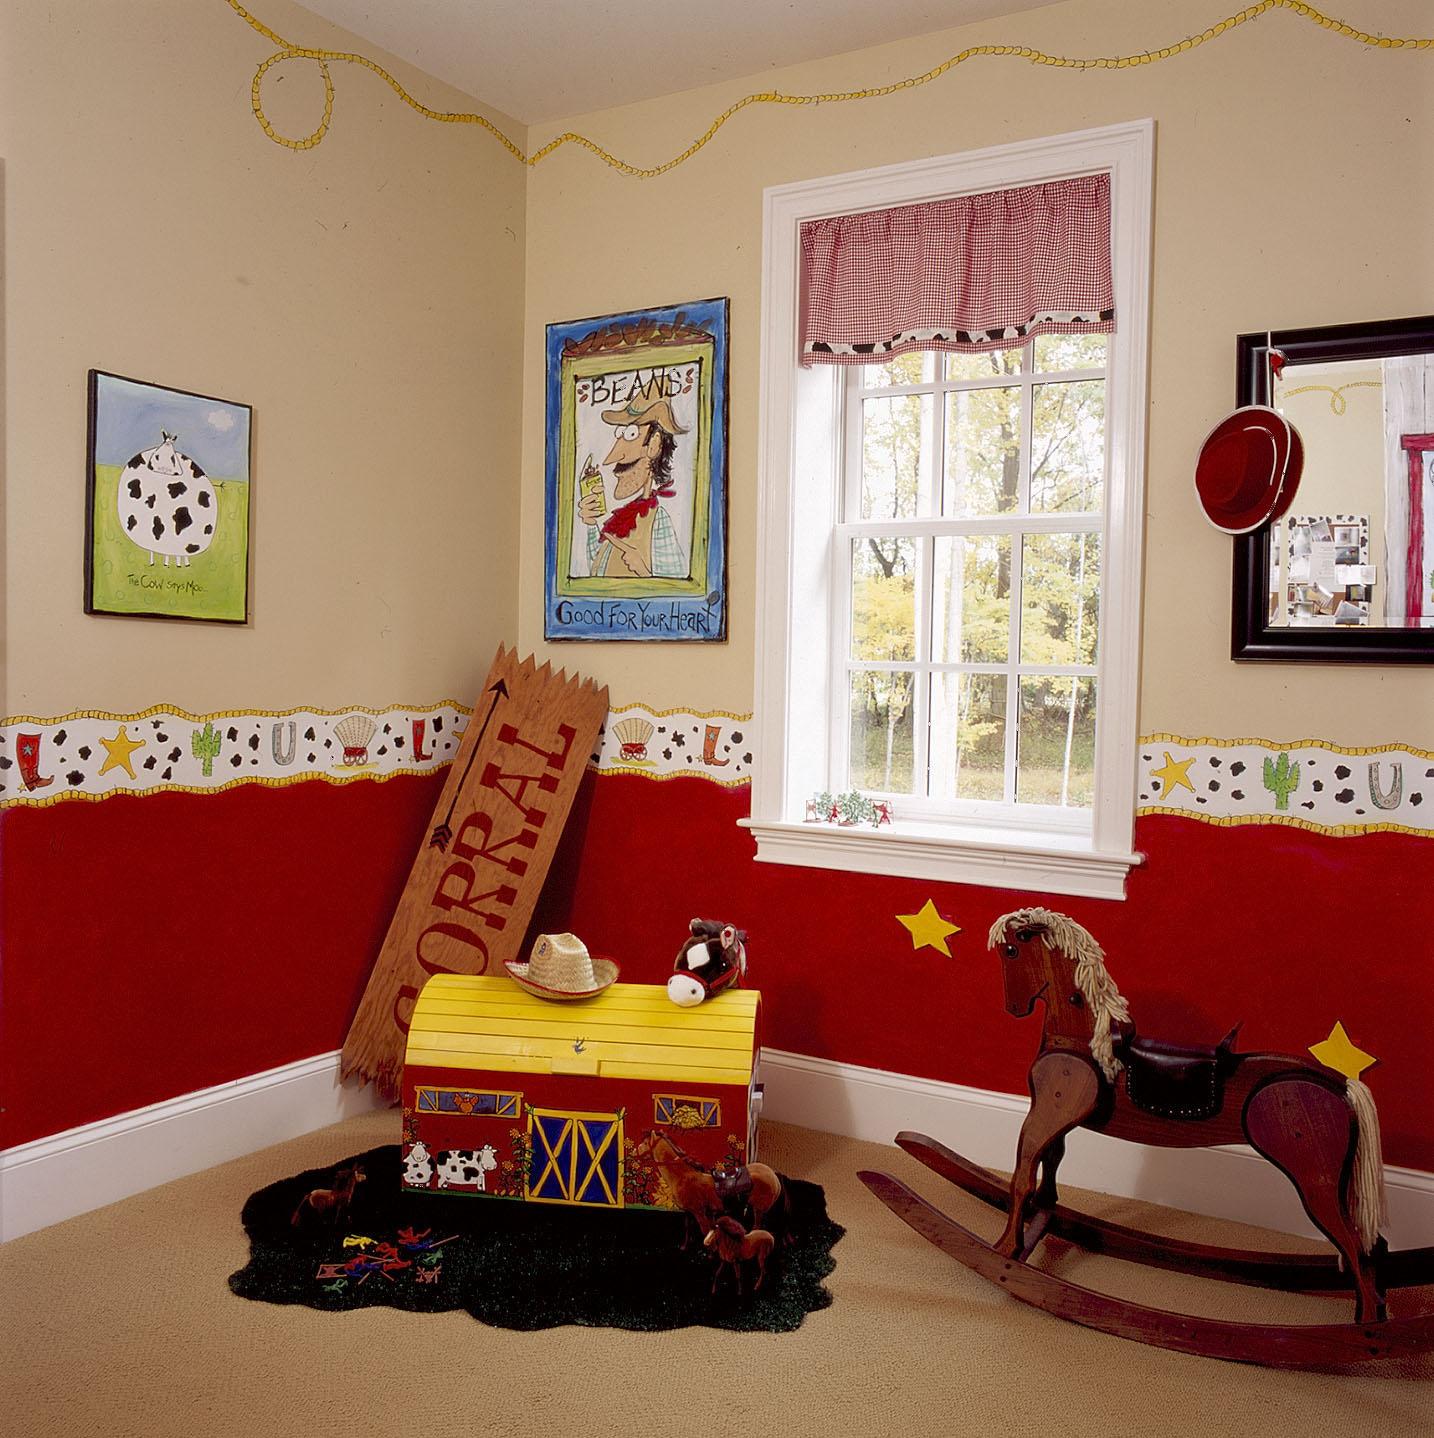 Whimsical Cowboy Room - Design Dazzle